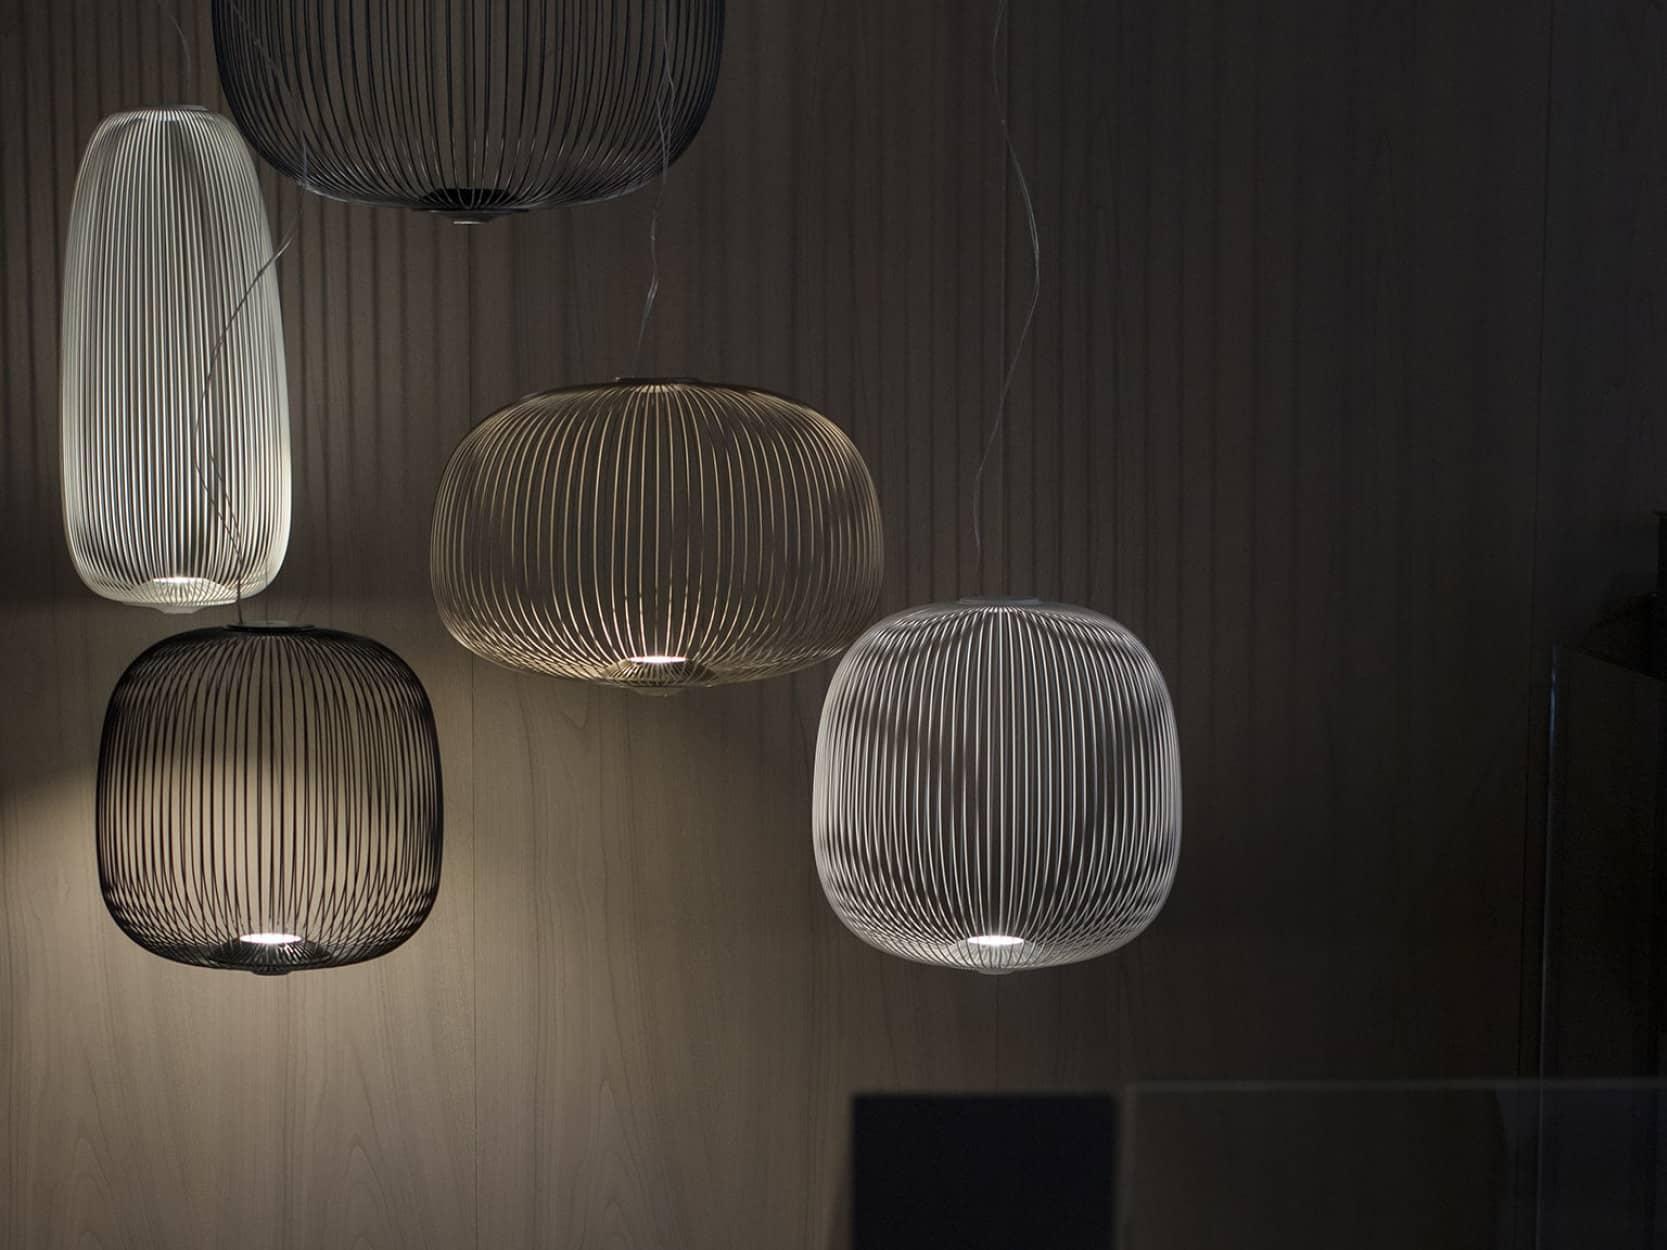 Foscarini hanglamp Spokes3 sfeer